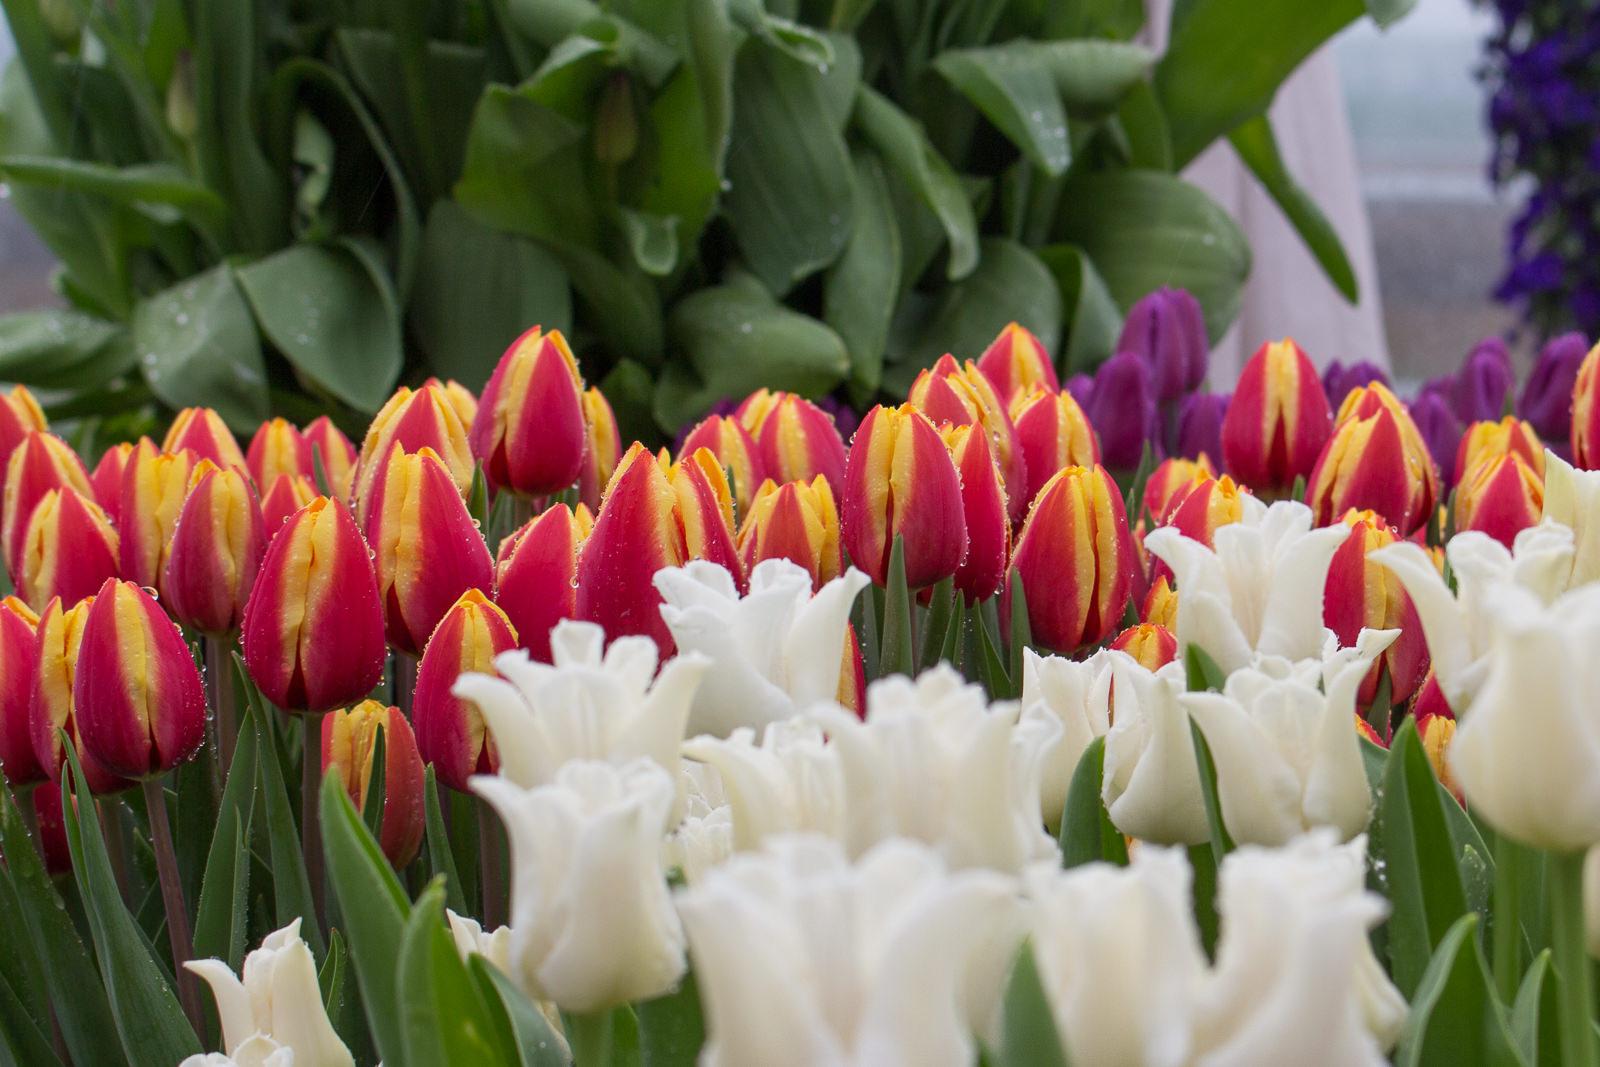 Flantuas, tulpen, flevoland, cabriotour, roadtrip, tulpenroute